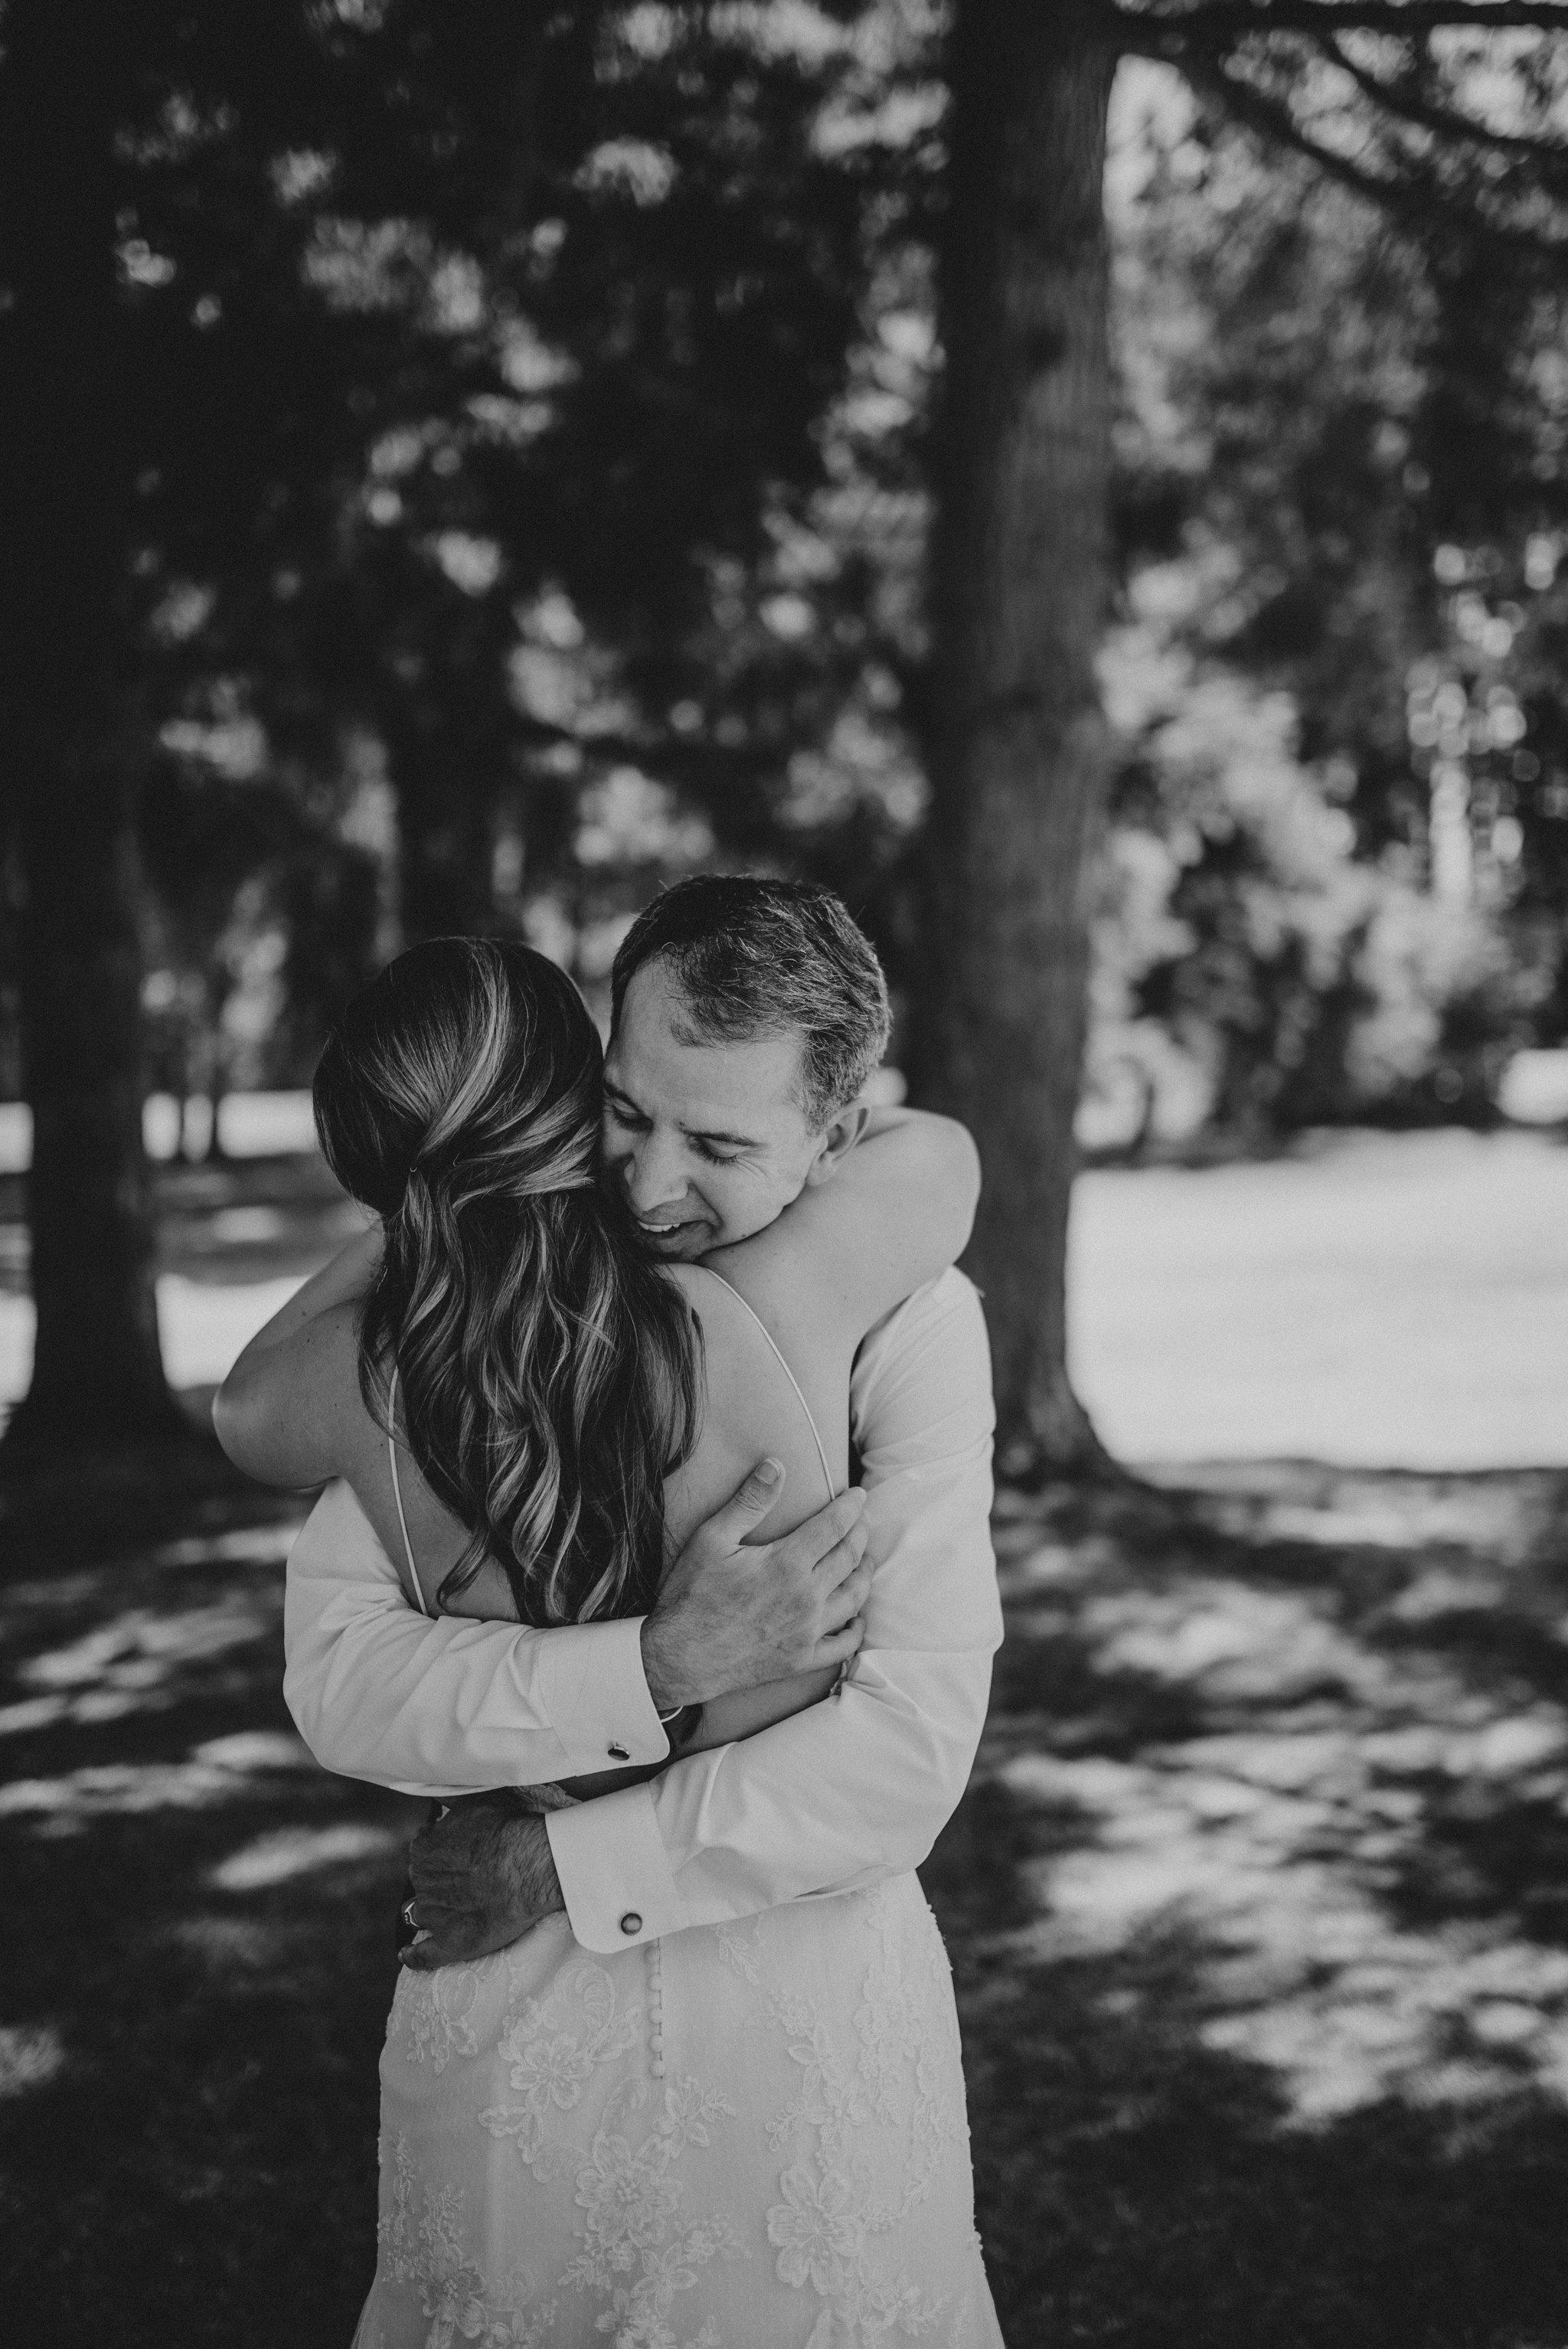 kristen-and-cody-the-kelley-farm-wedding-seattle-photographer-caitlyn-nikula-27.jpg